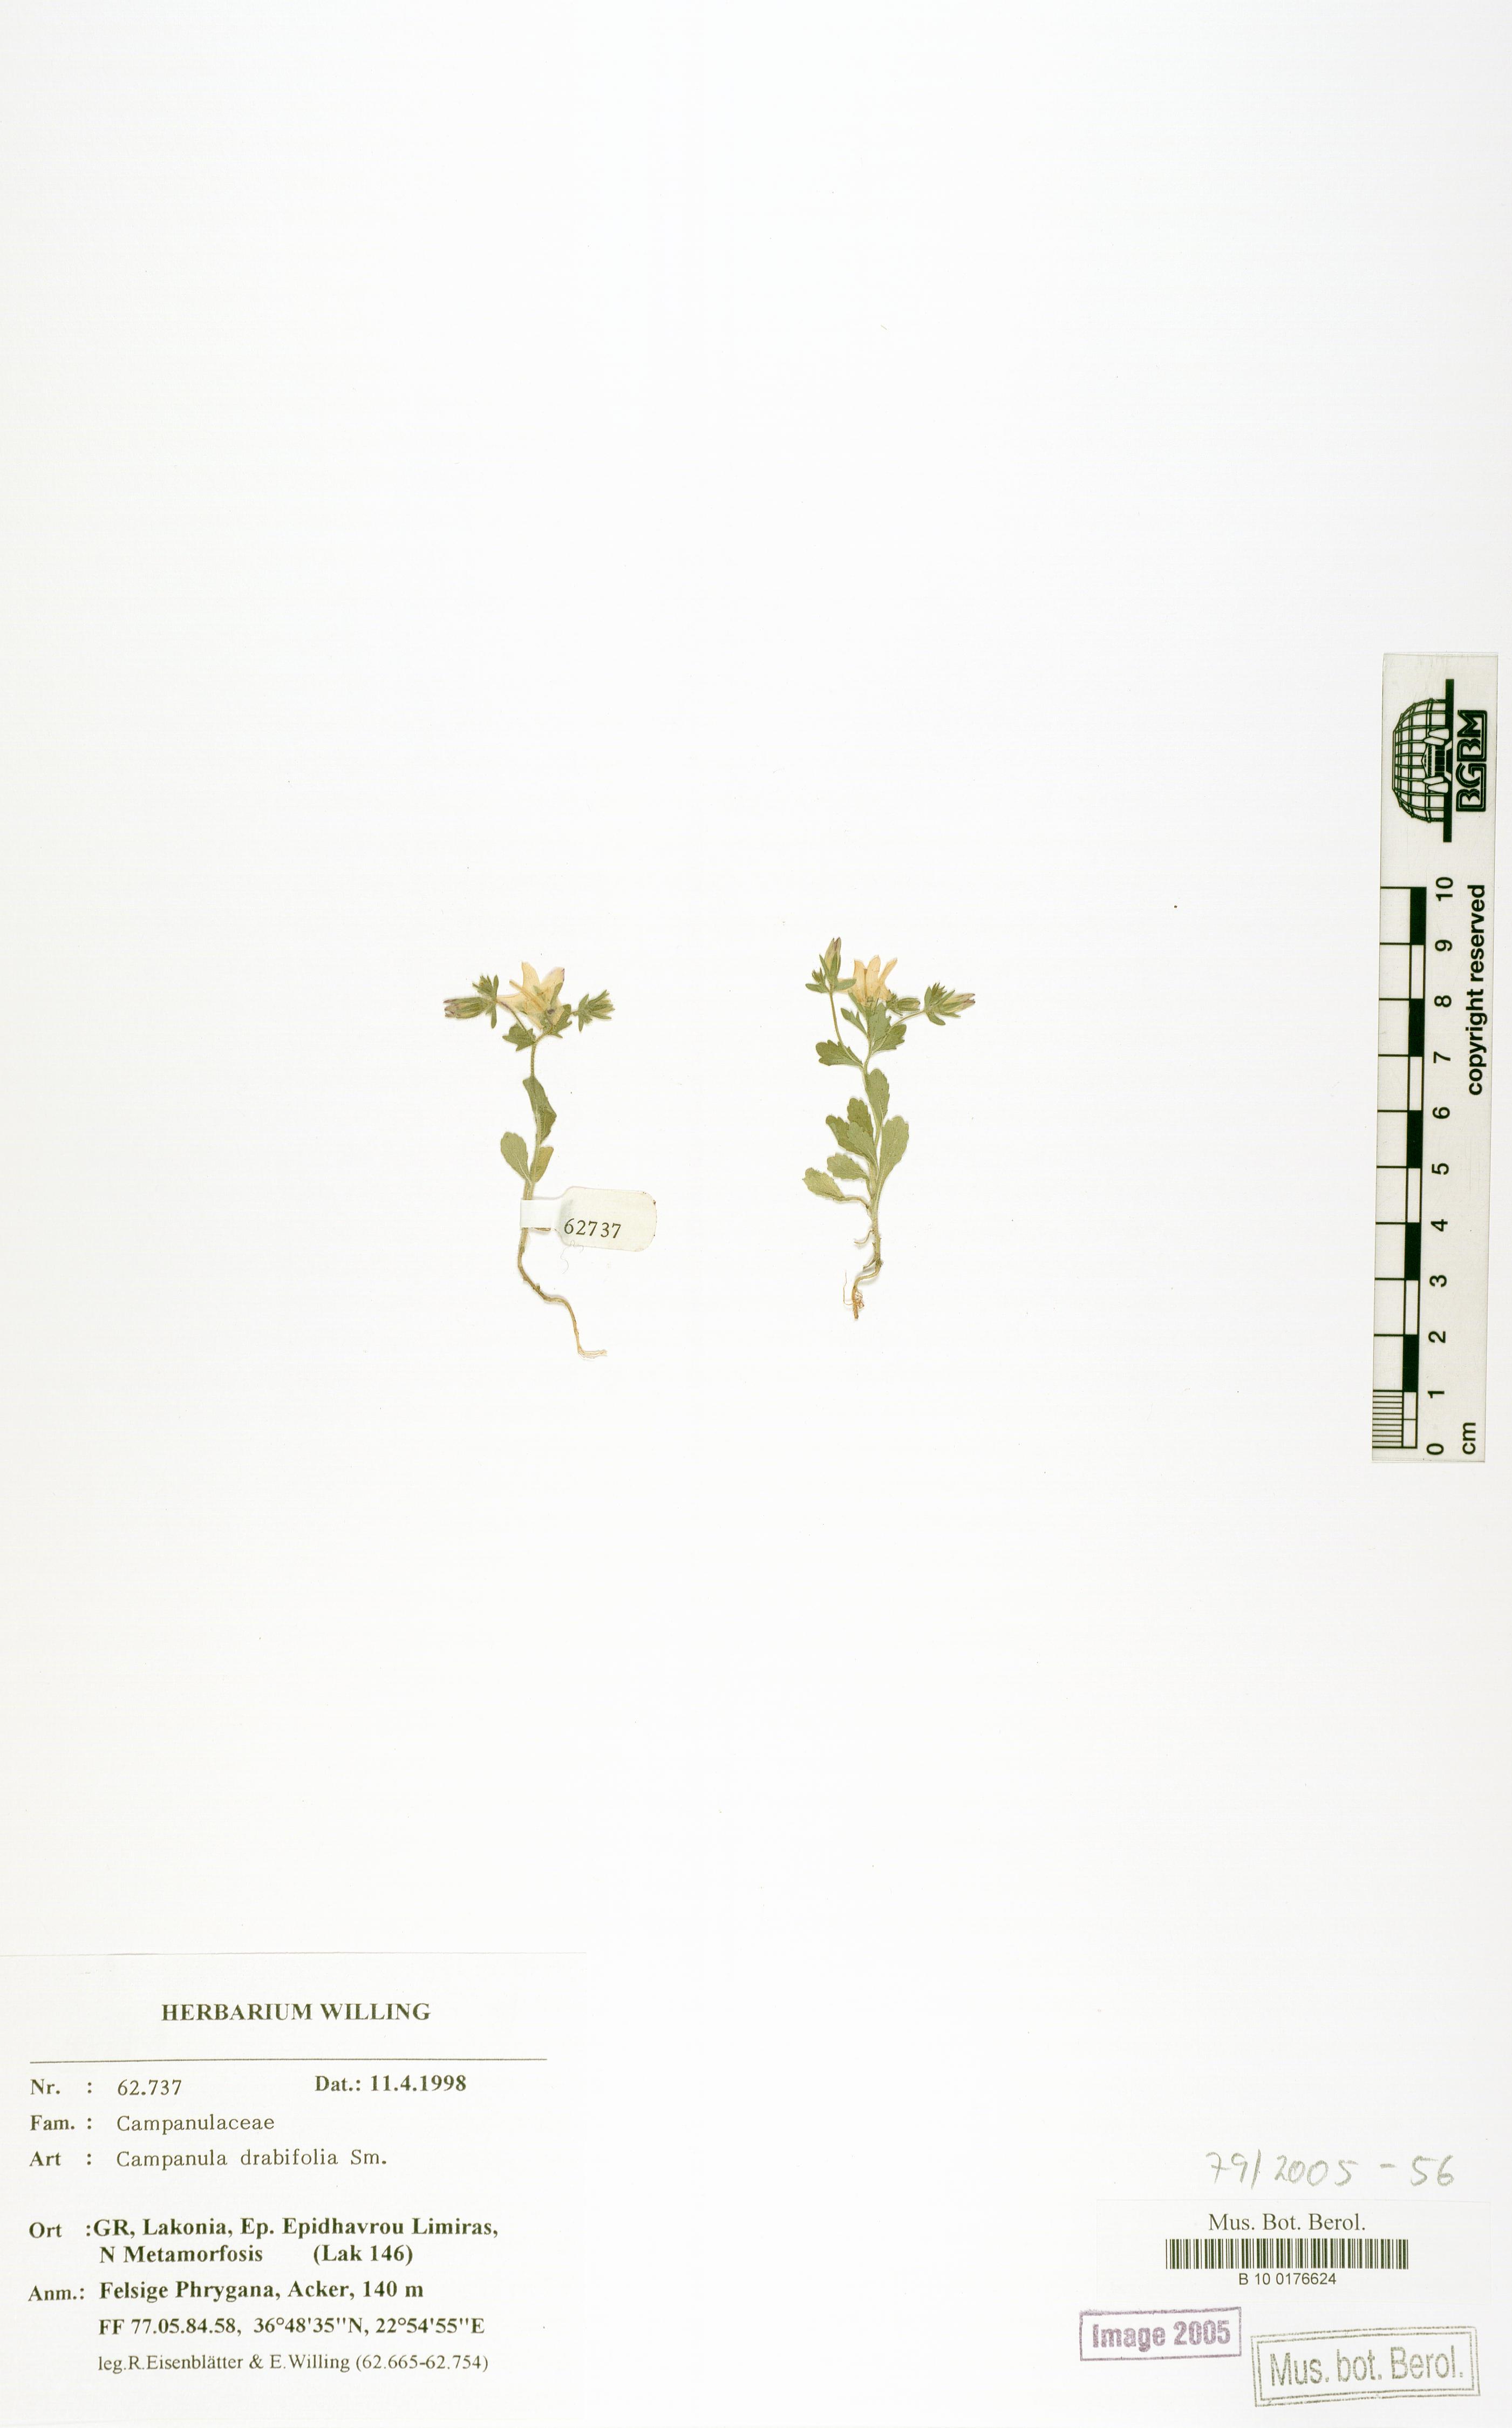 http://ww2.bgbm.org/herbarium/images/B/10/01/76/62/B_10_0176624.jpg